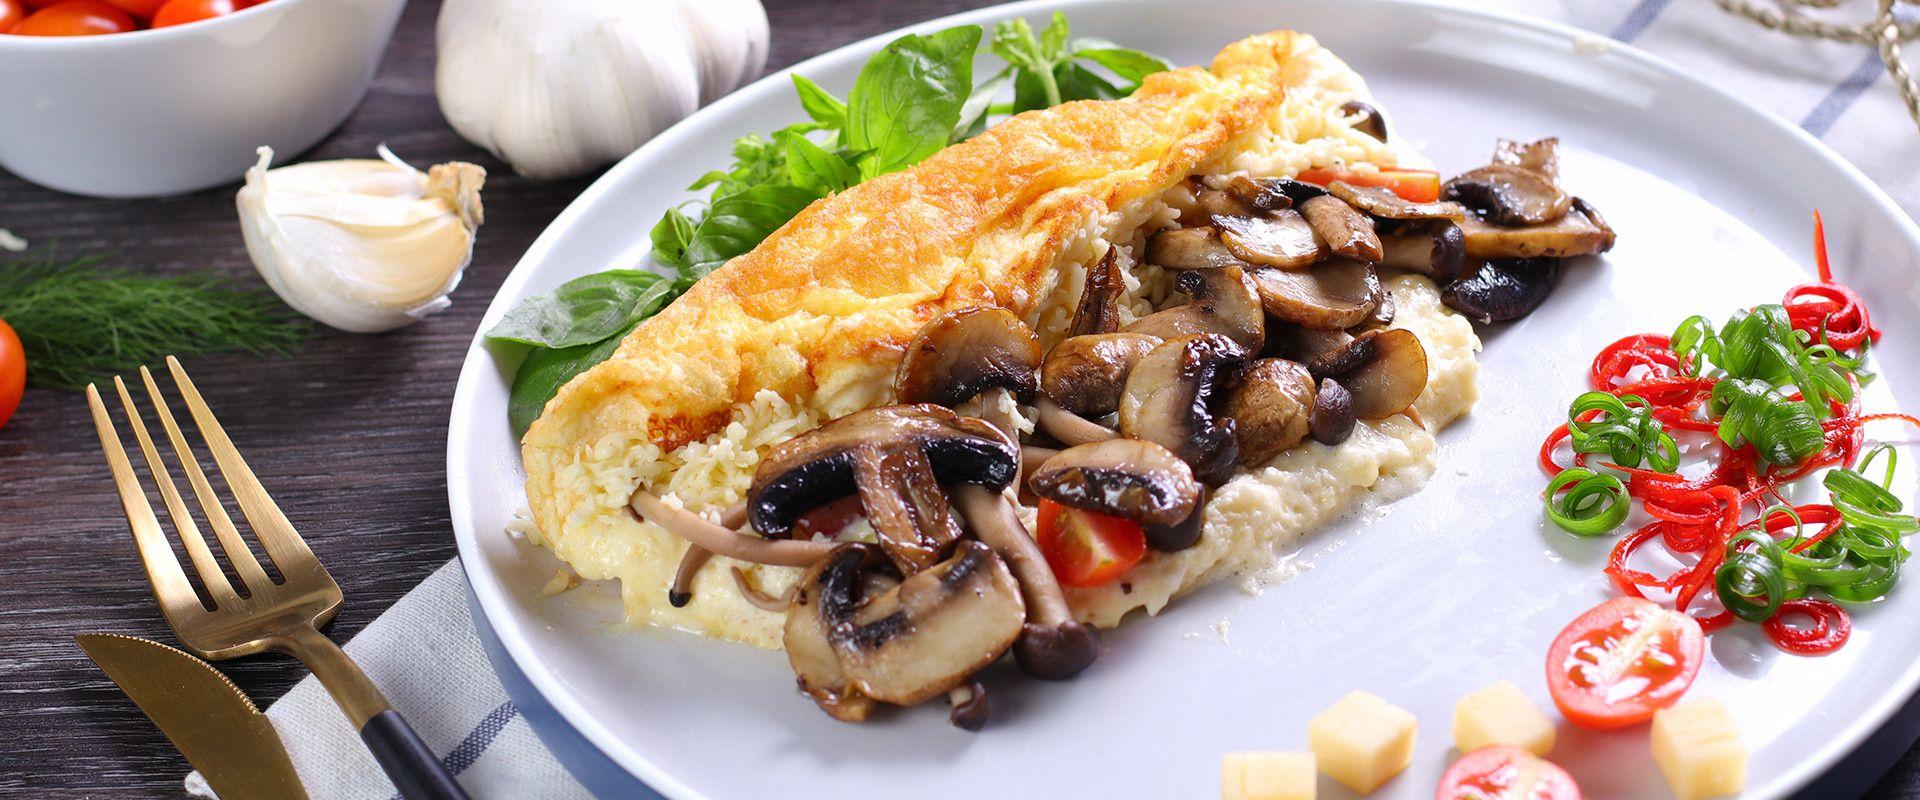 Cheese Soufle Omelet Dapur Keju Prochiz Telur Dadar Keju Masakan